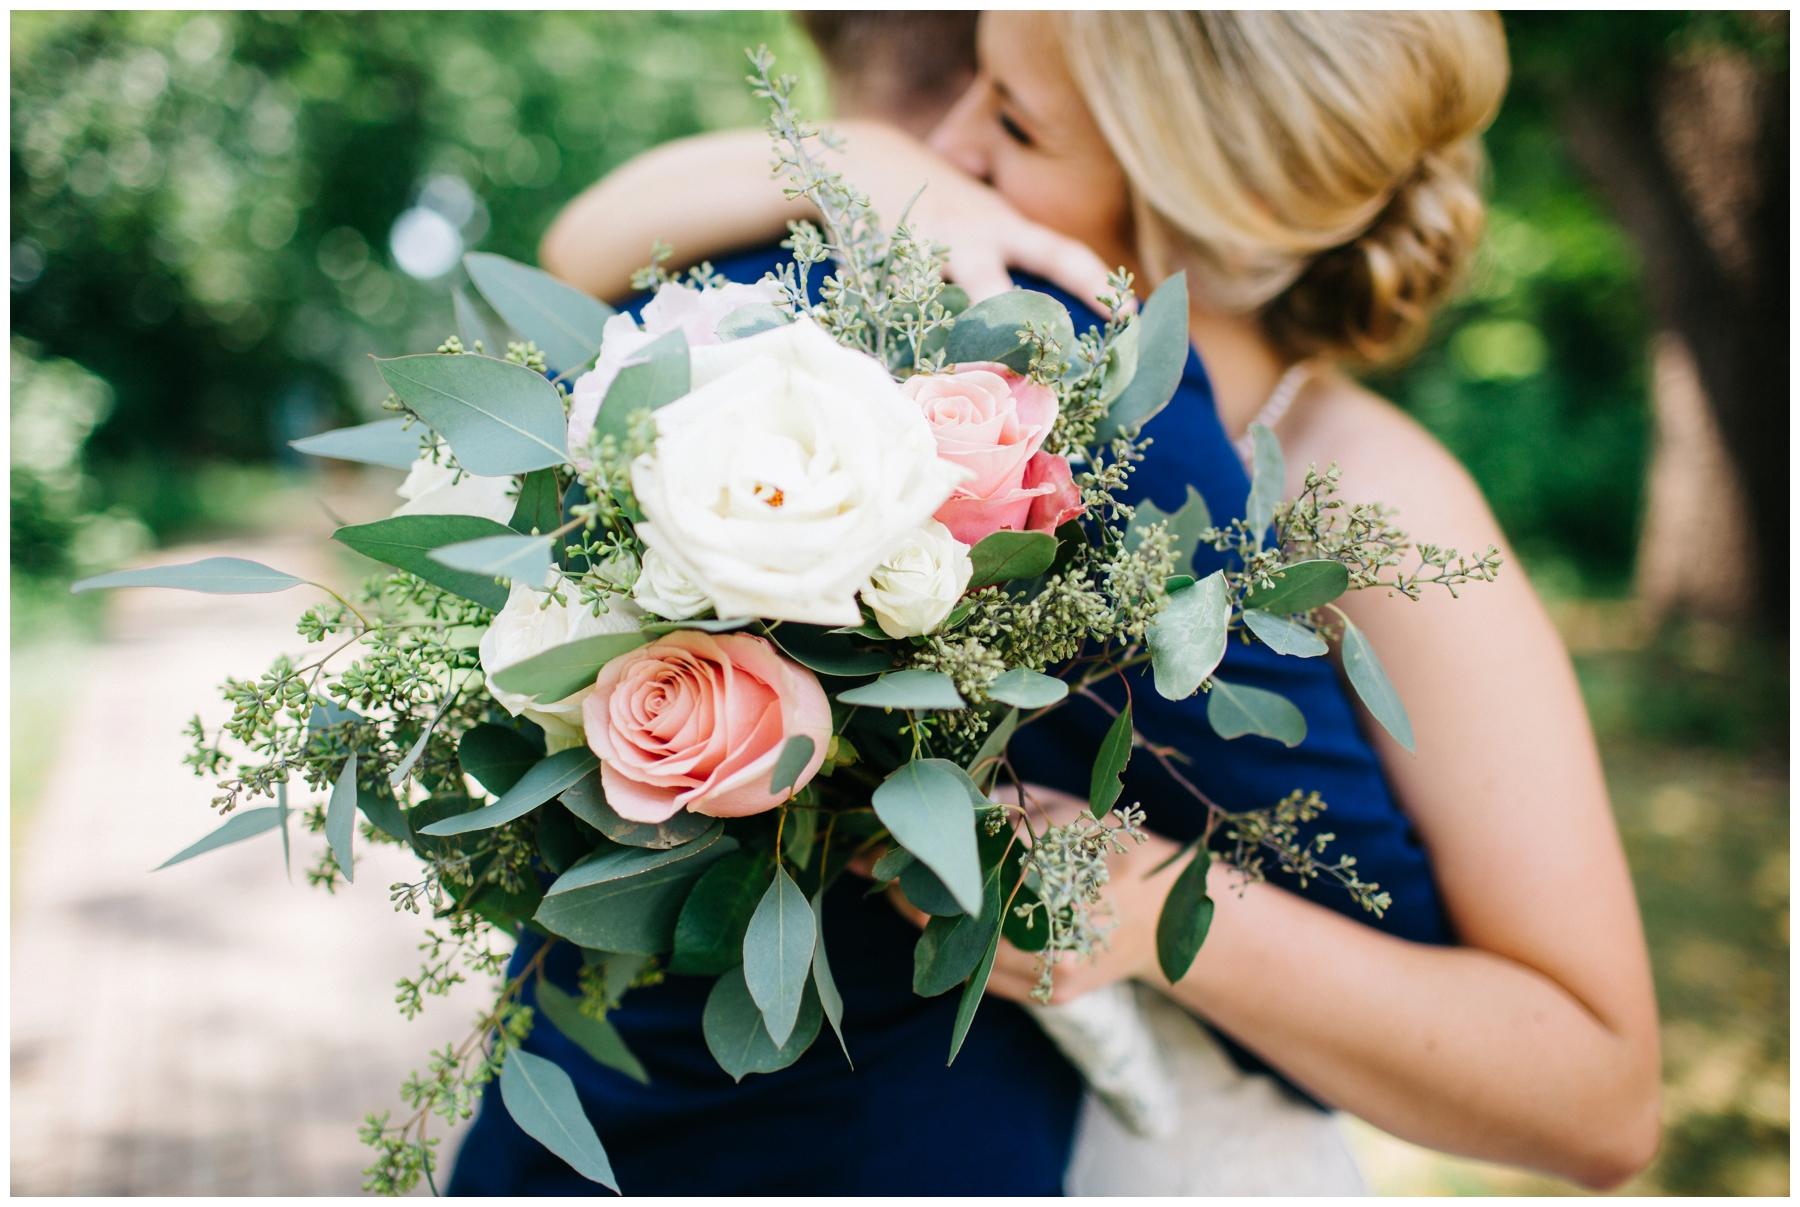 allison-corrin-kansas-city-engagement-wedding-photographer_0018.jpg